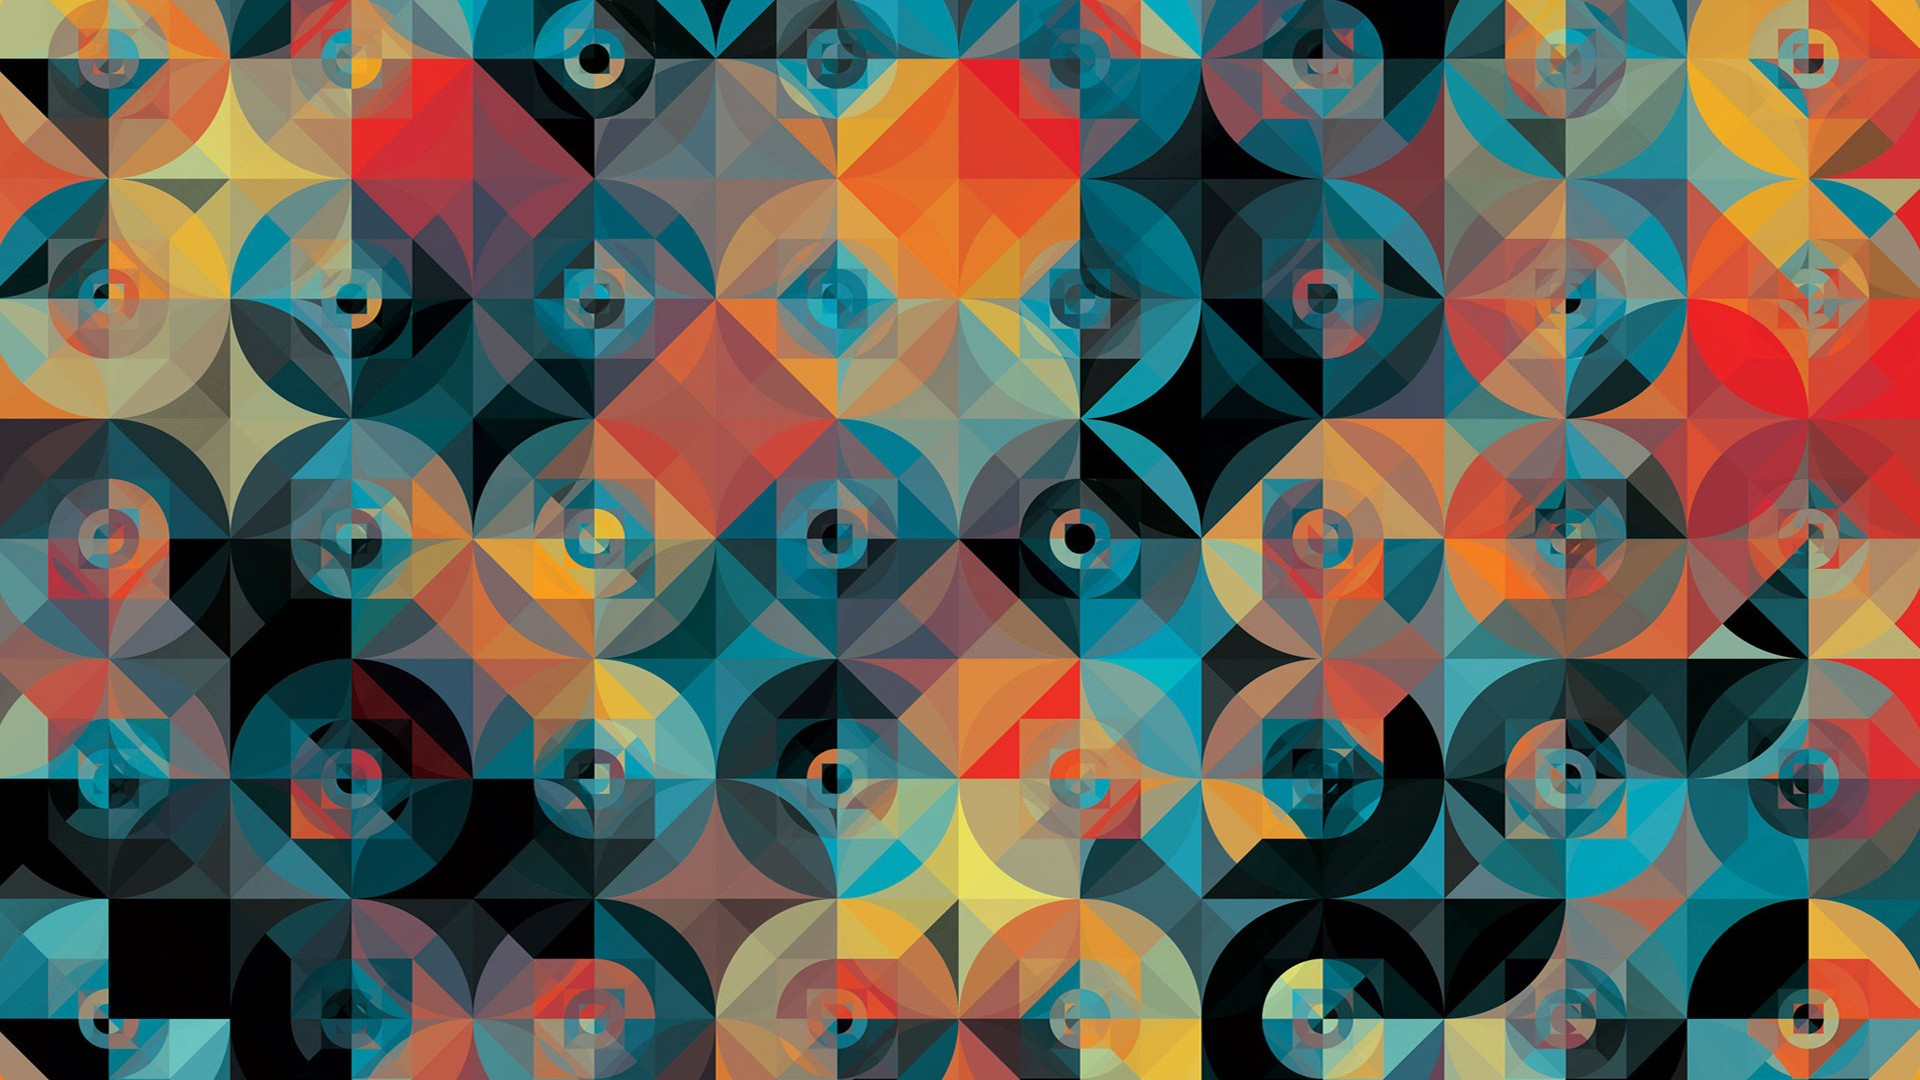 General 1920x1080 digital art colorful square geometry Andy Gilmore